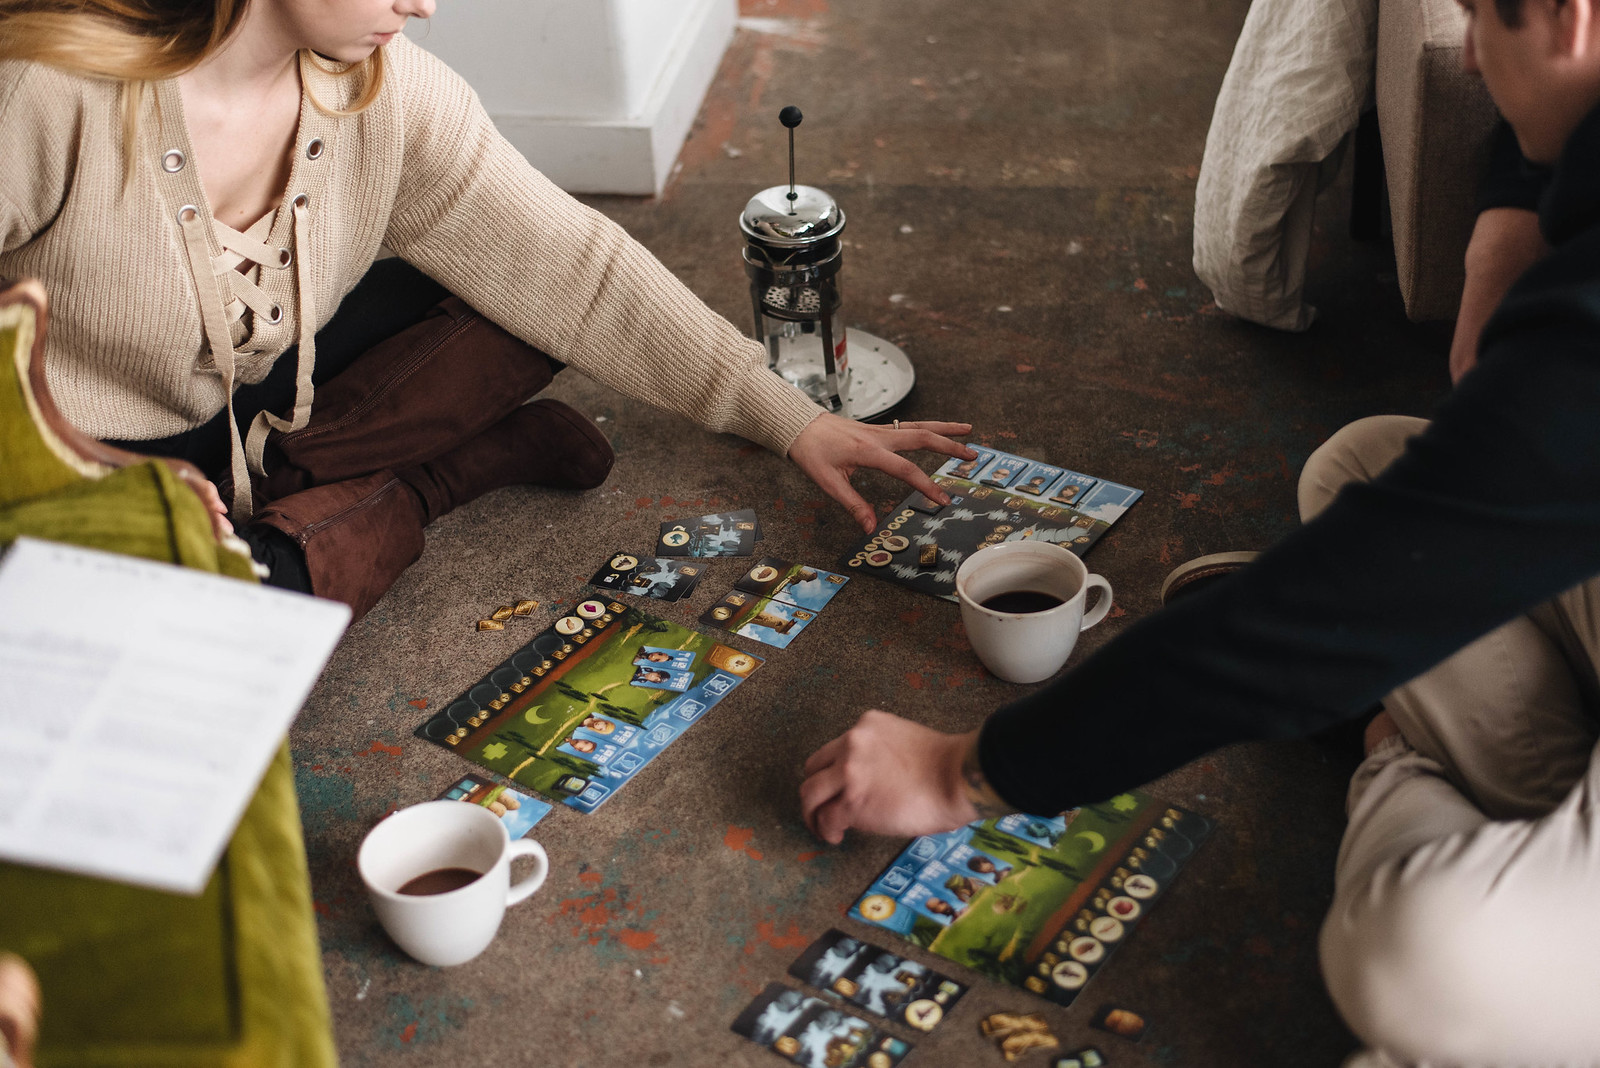 Board Game Couples Studio Session on juliettelaura.com